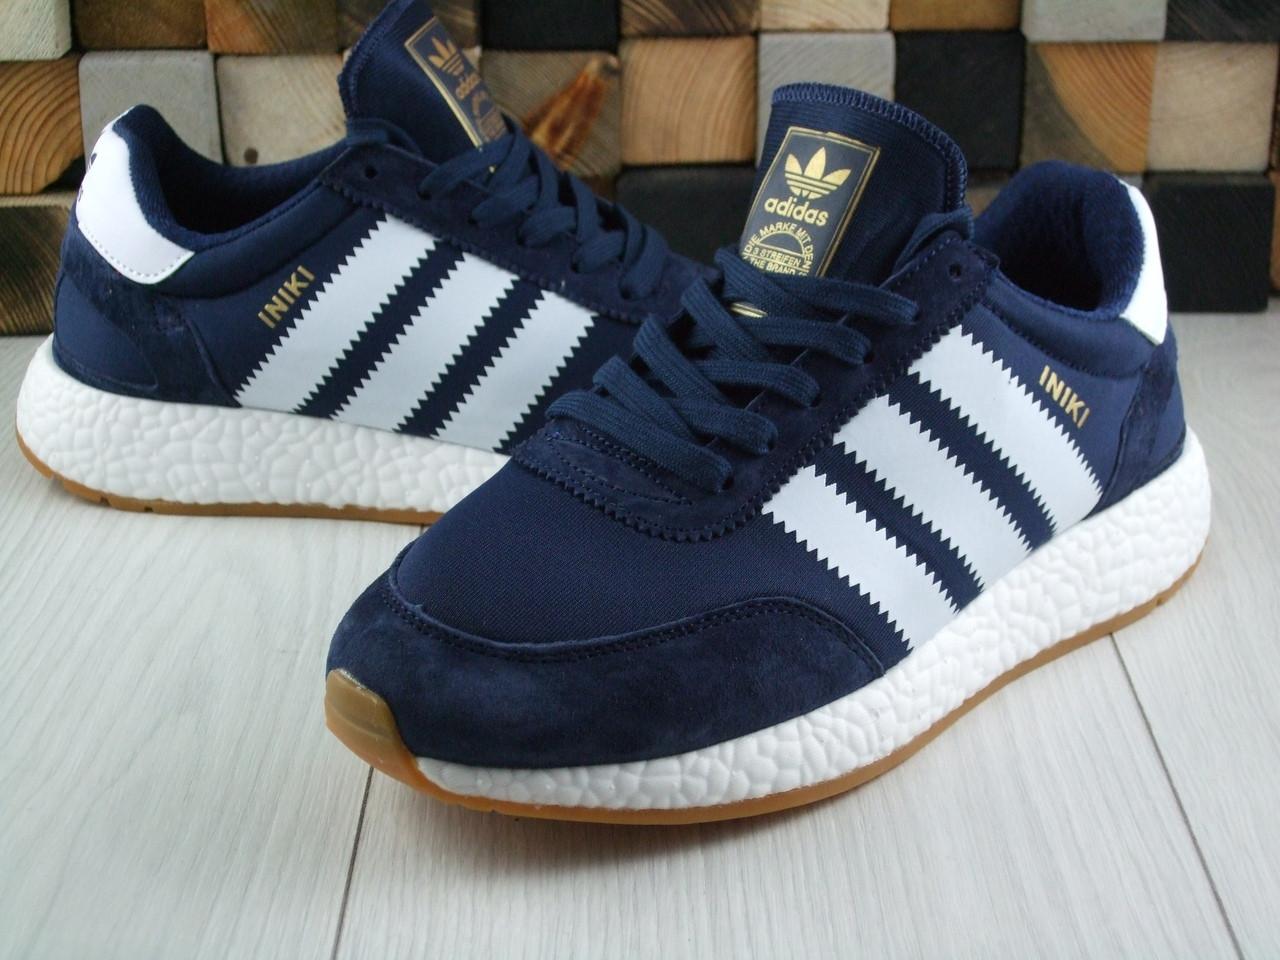 Кроссовки мужские Adidas Iniki blue Адидас (Реплика ААА+) - Pear Group  Store в 9c1a86975e264